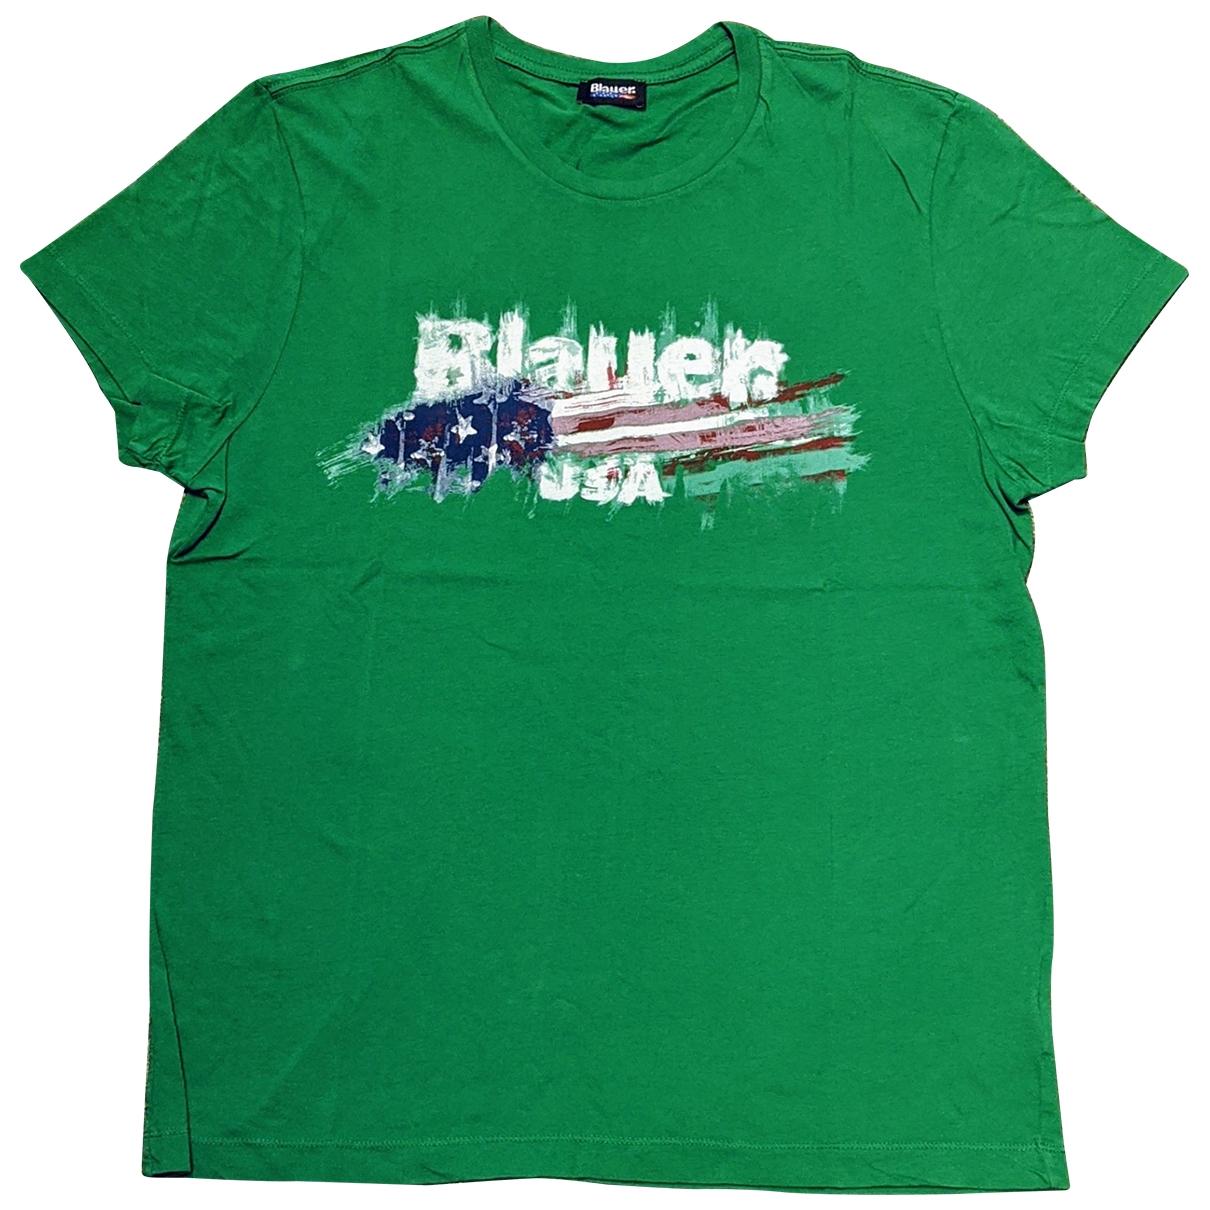 Blauer \N Green Cotton T-shirts for Men XL International